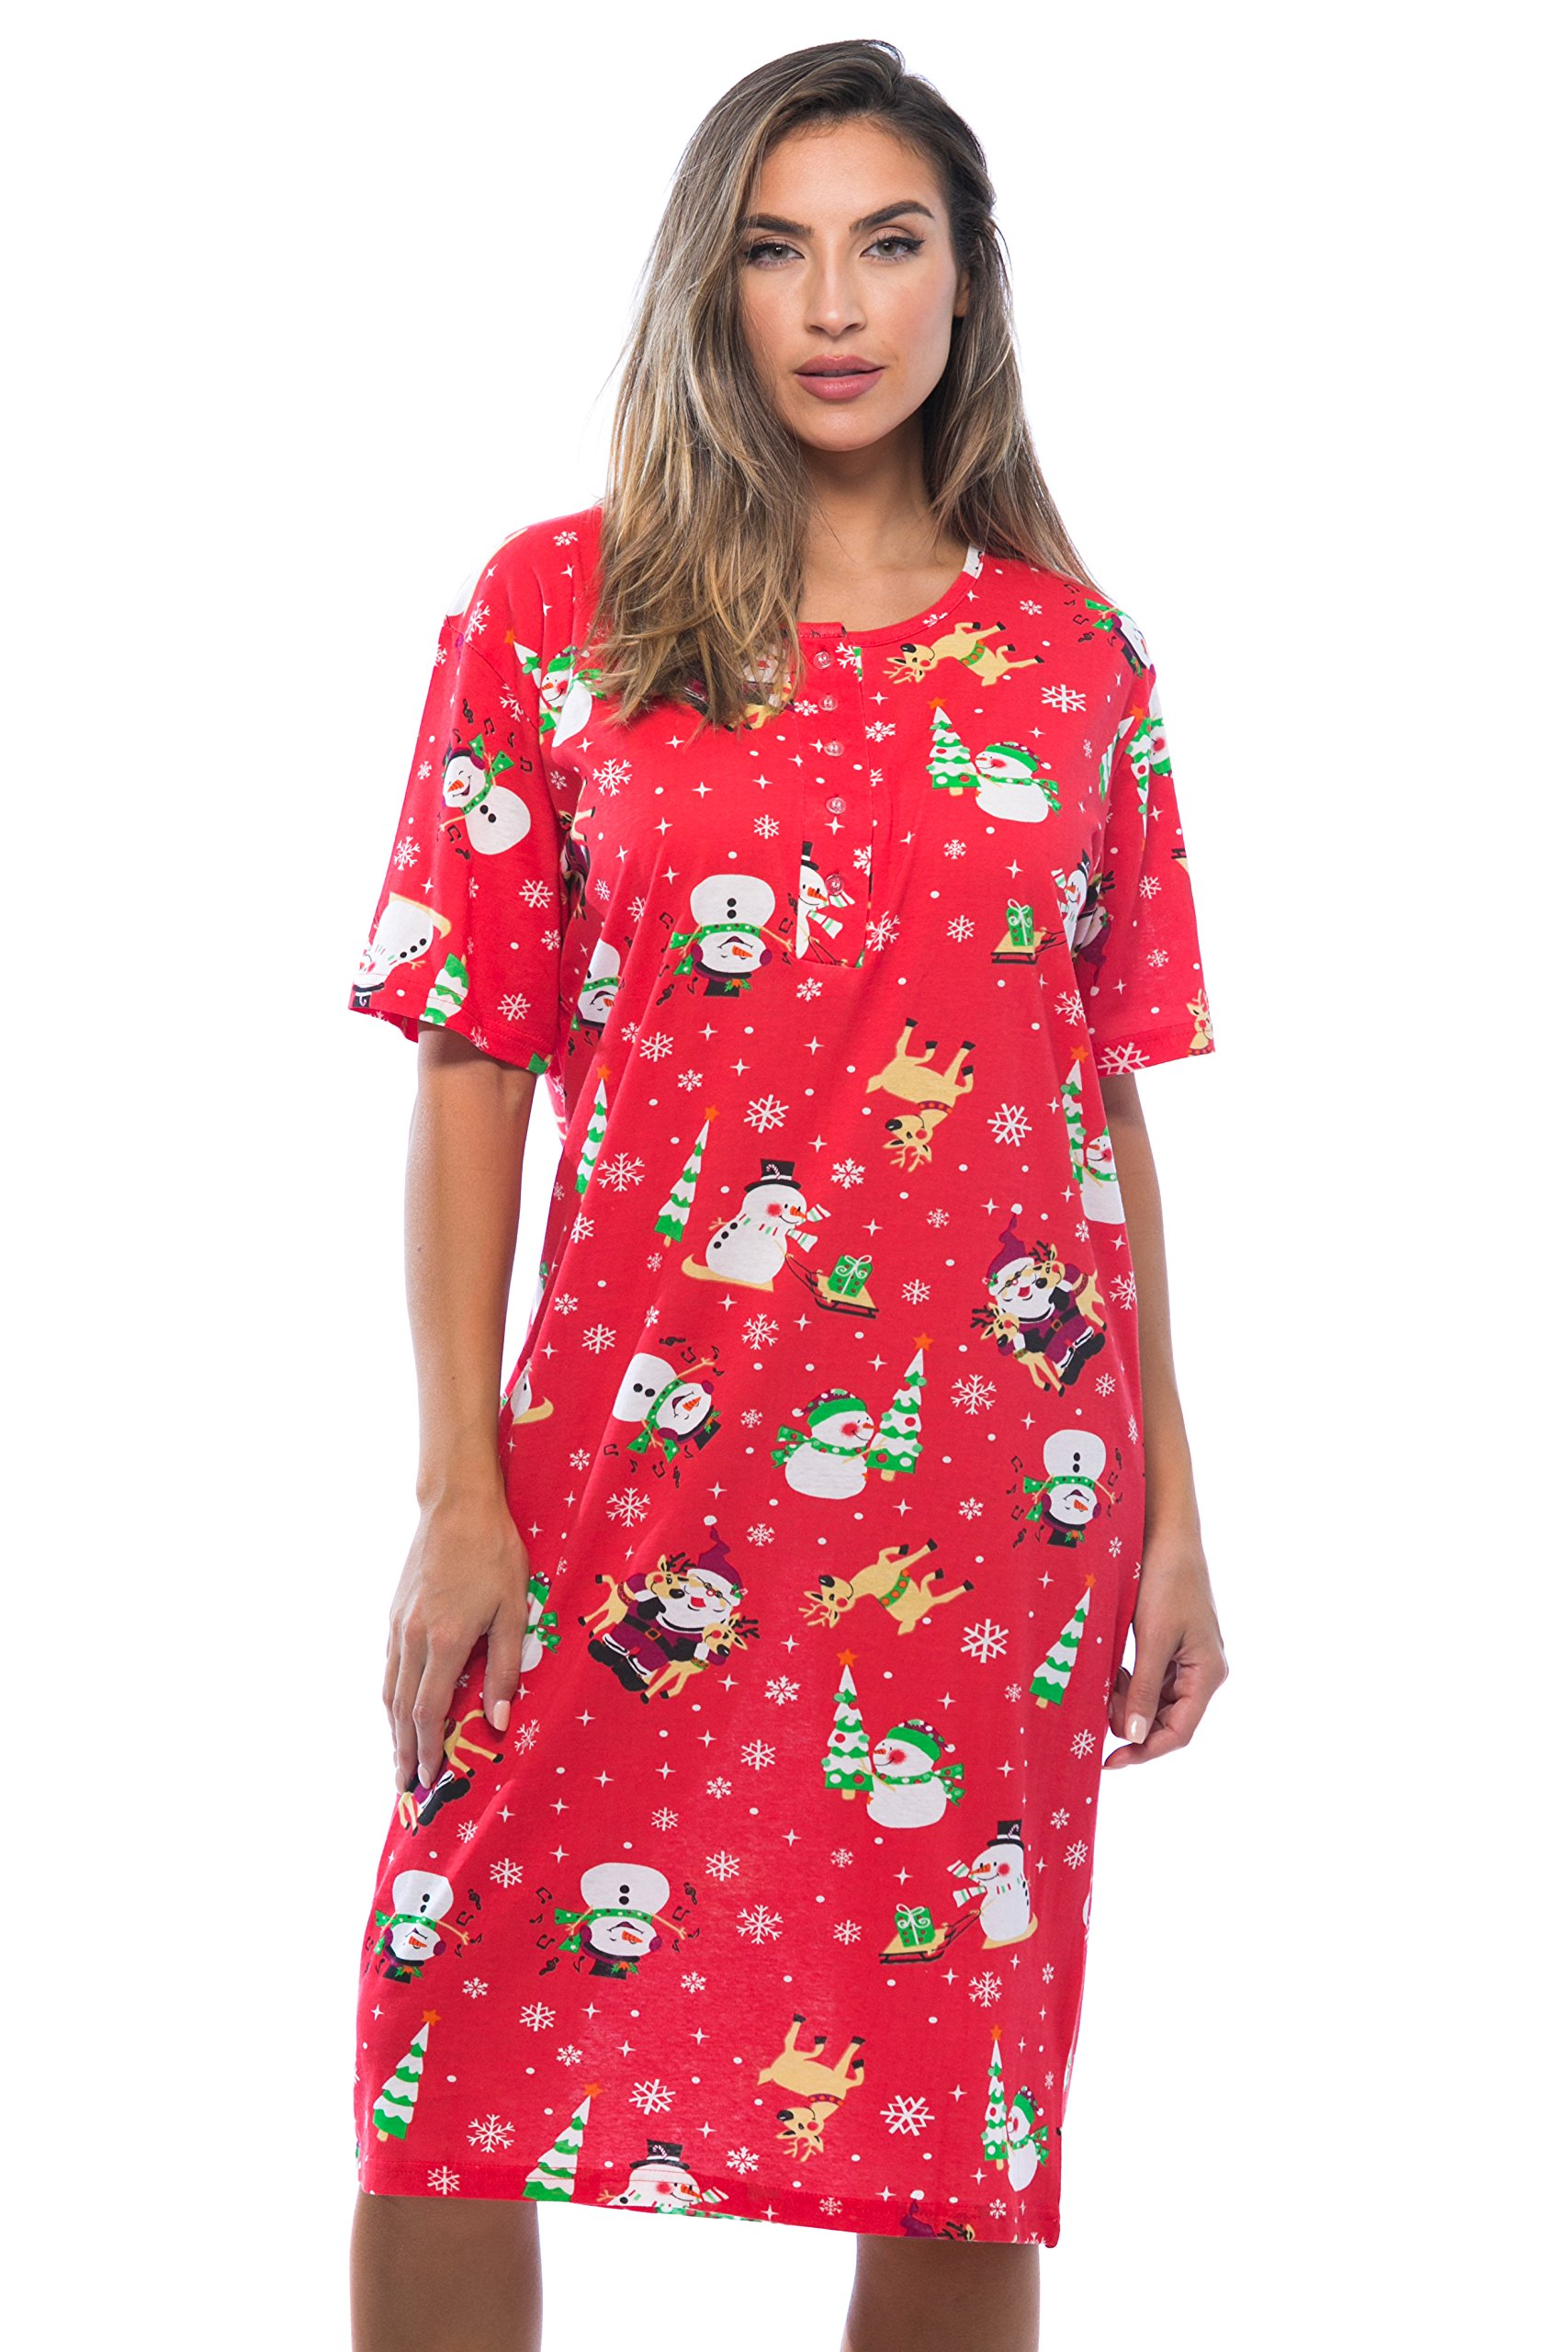 Plus Size Womens Short Sleeve Cotton Nightgown Sleep Dress ...